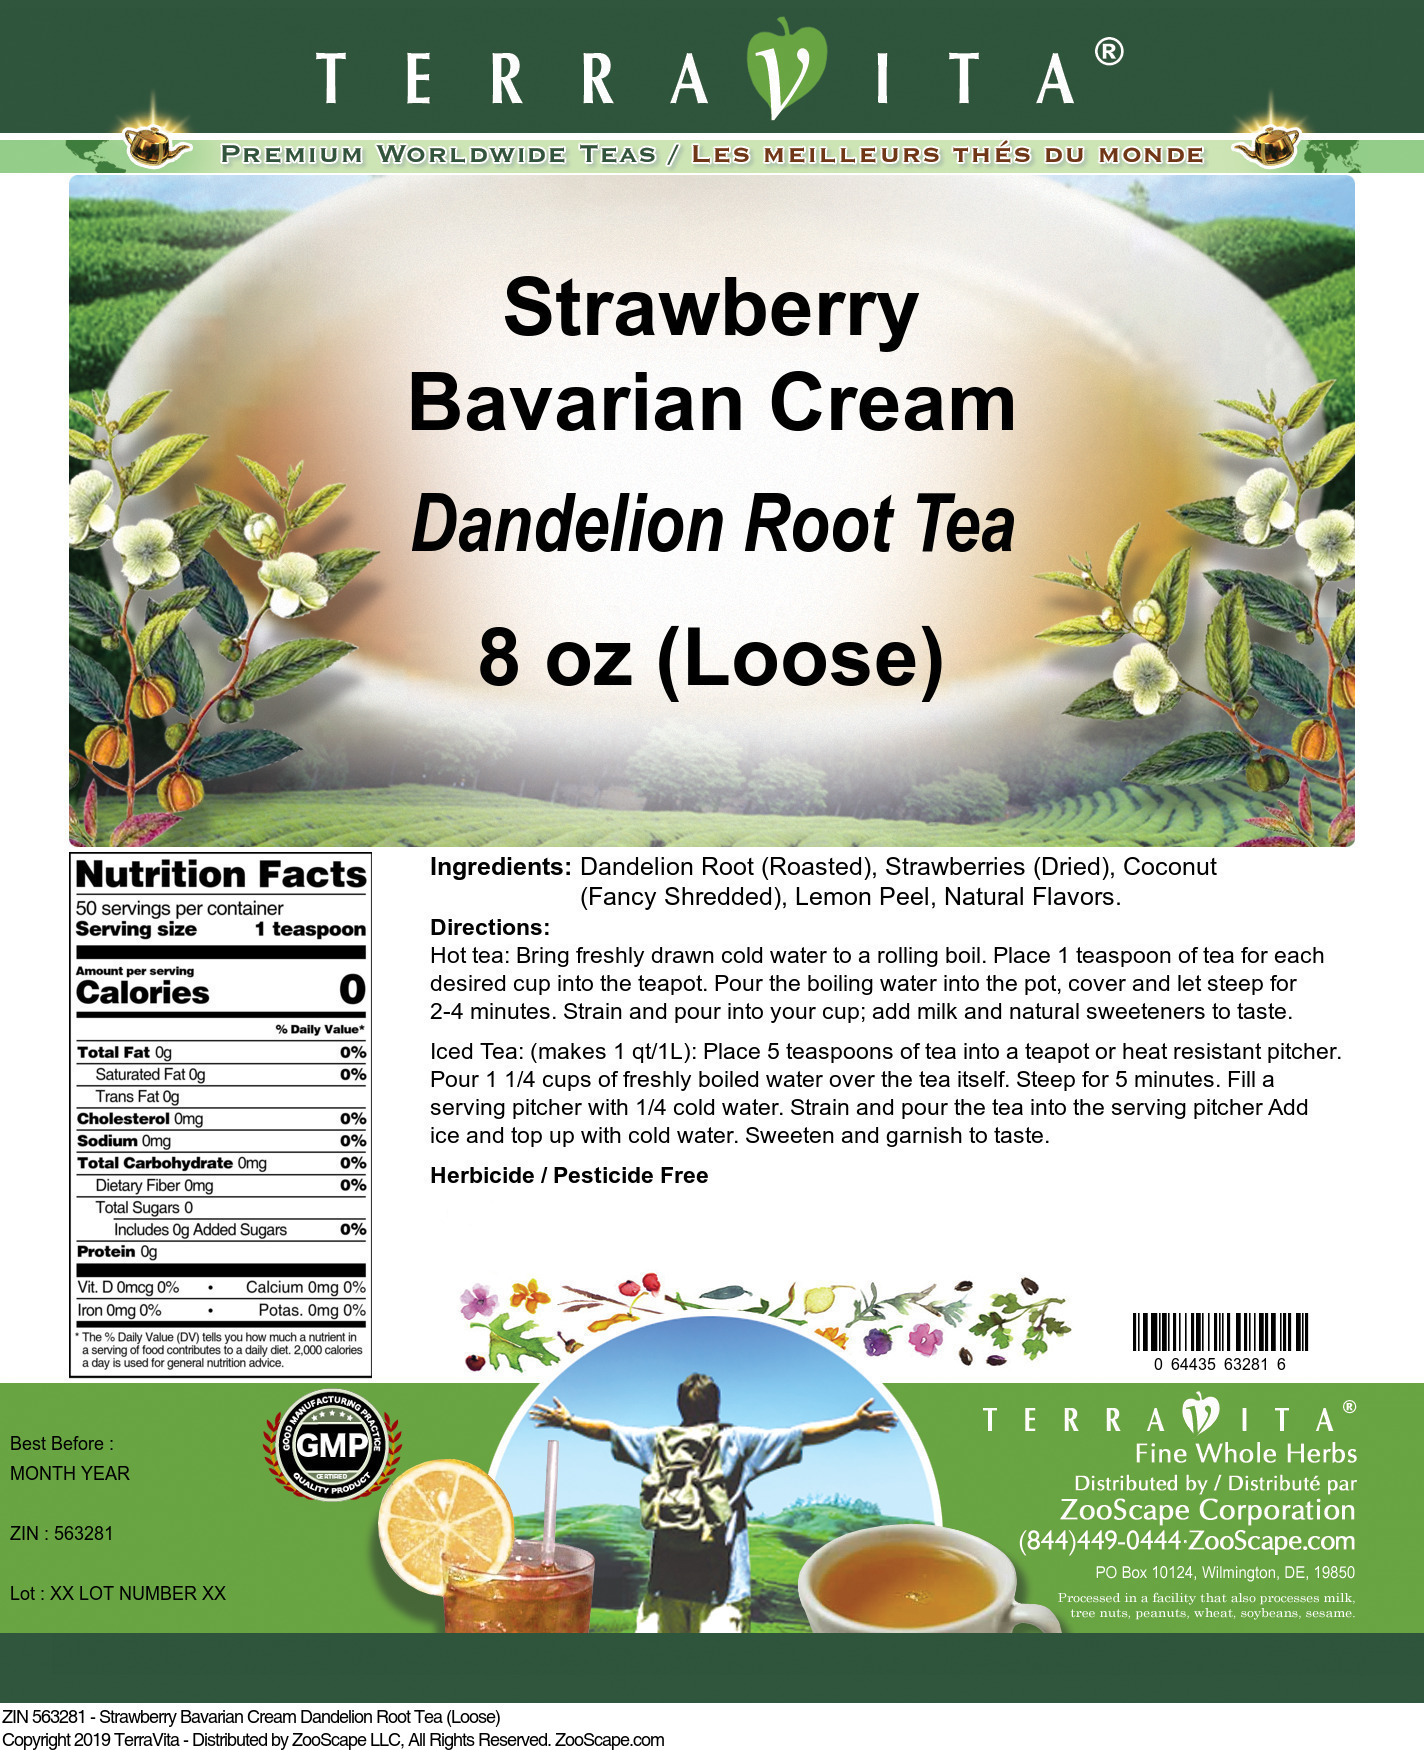 Strawberry Bavarian Cream Dandelion Root